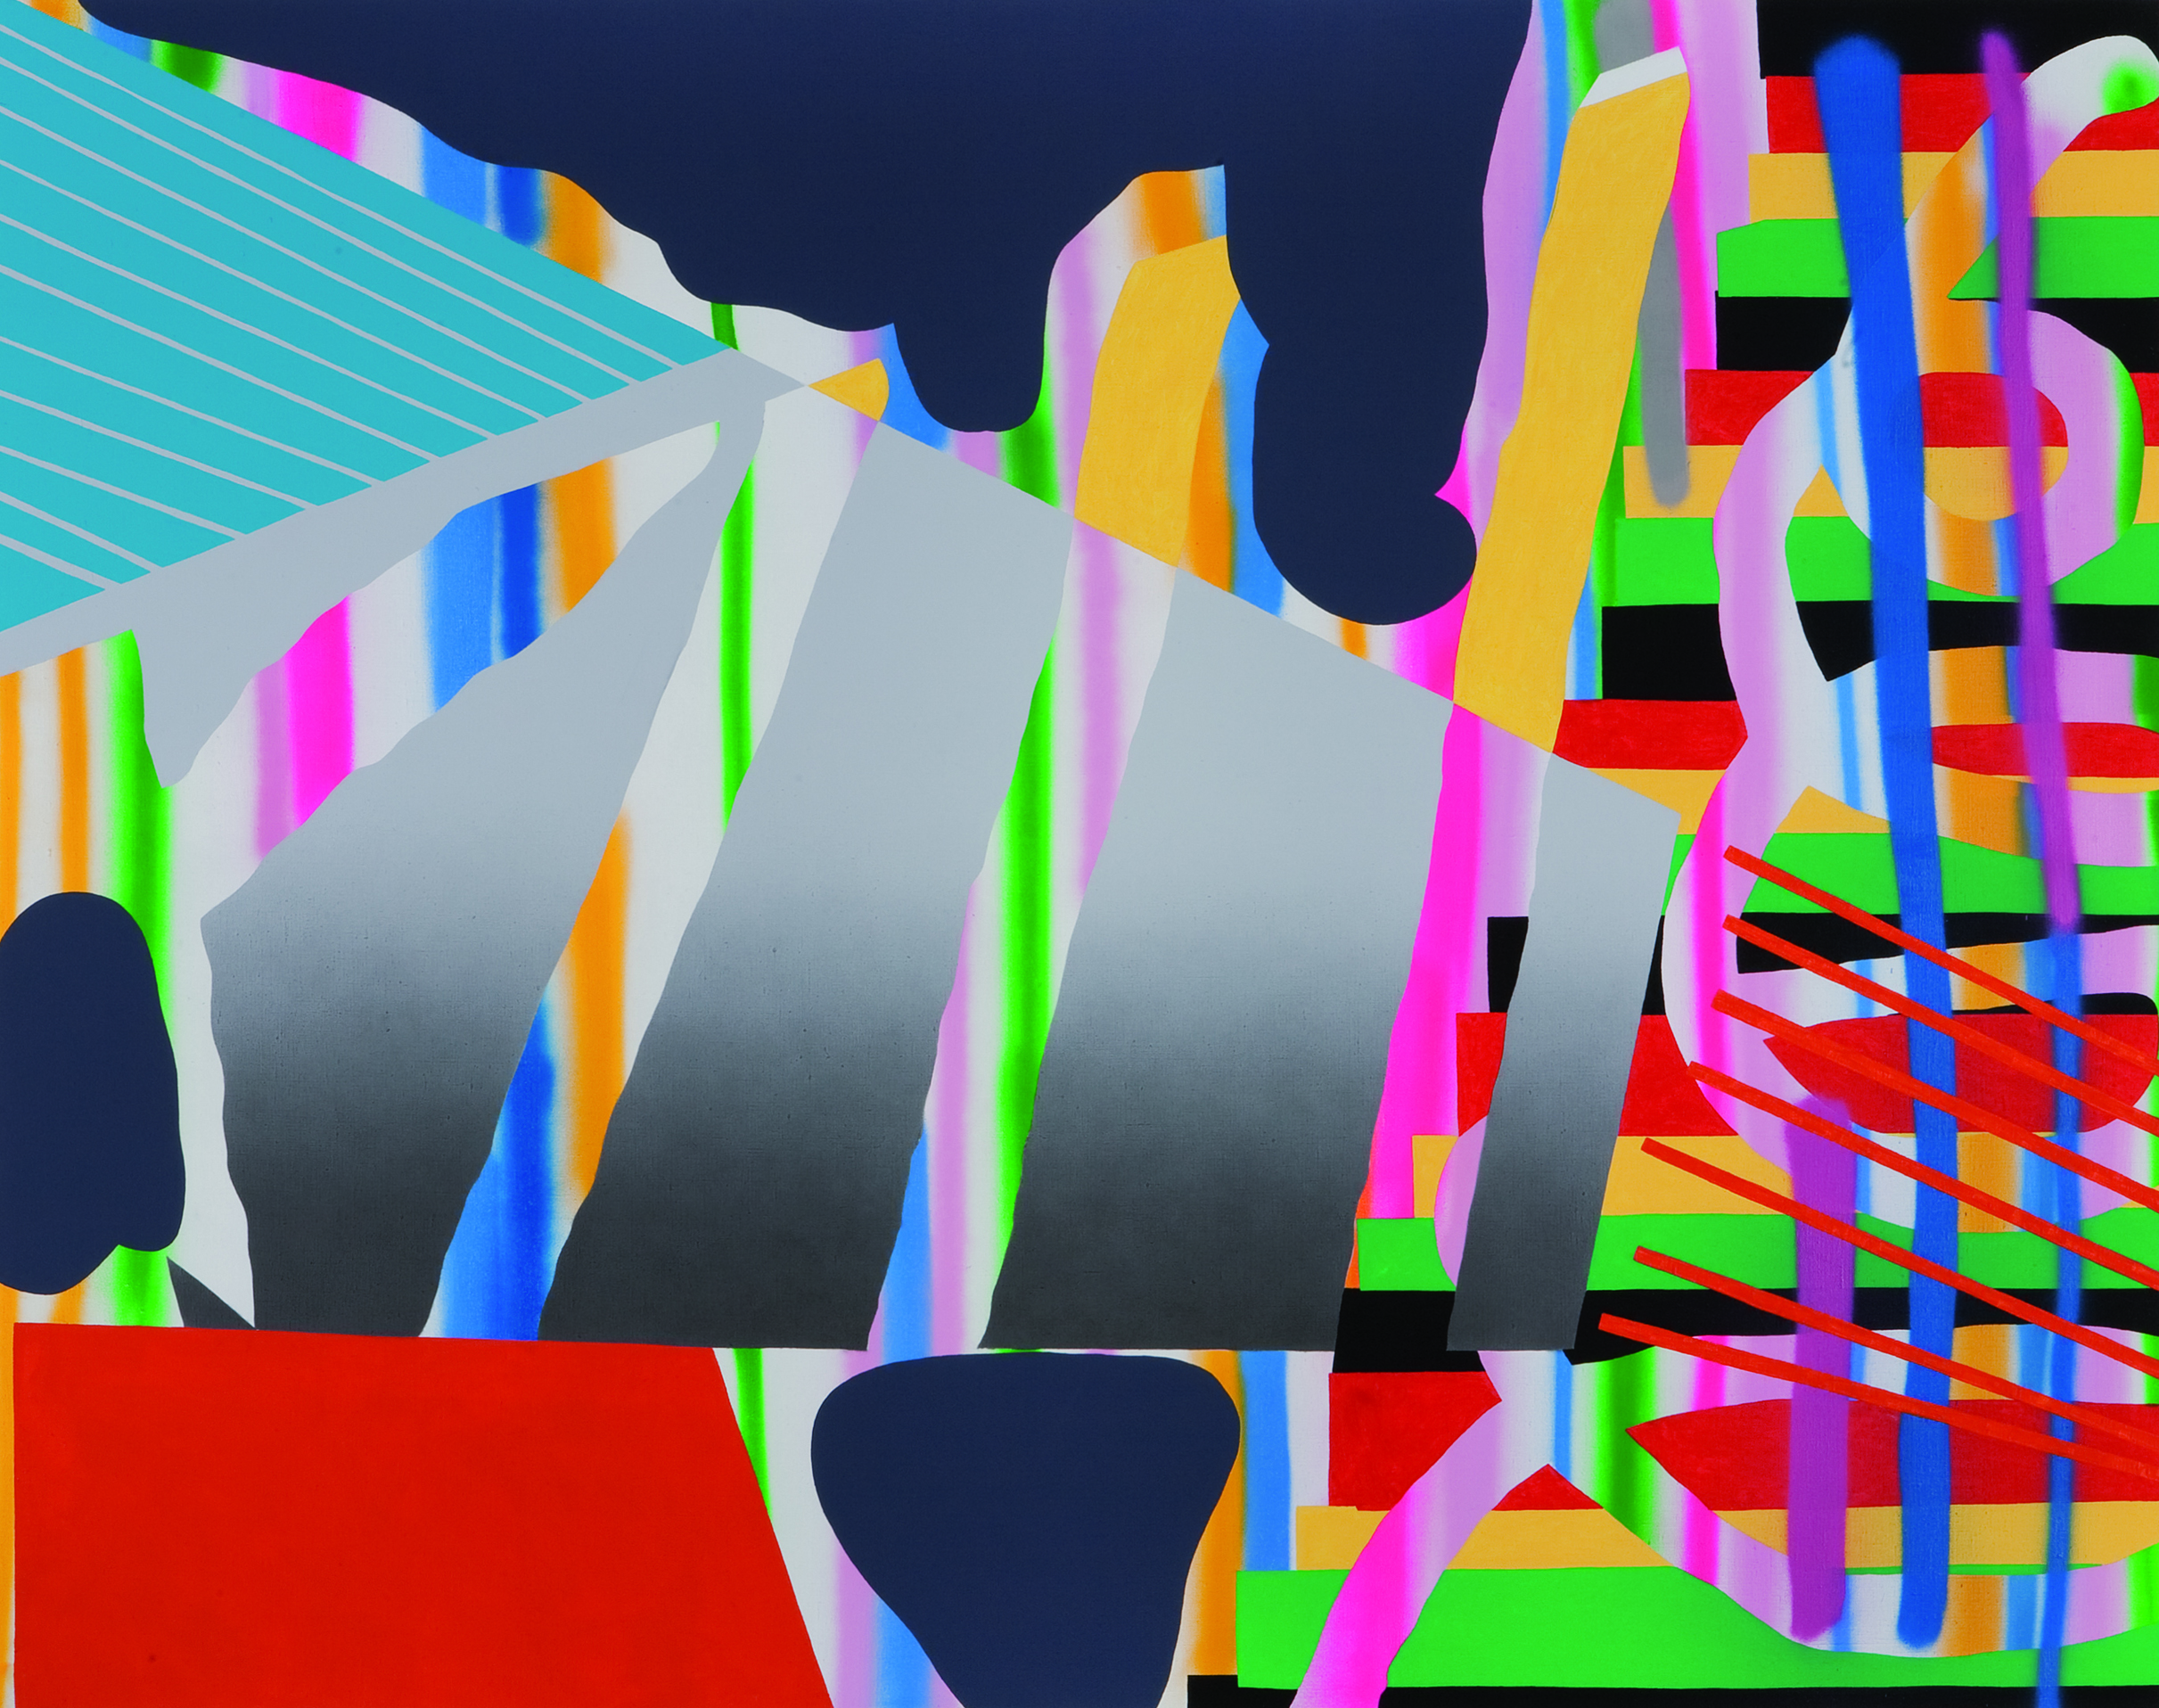 May, 2009, acrylic, spray on canvas, 160 x 200 cm